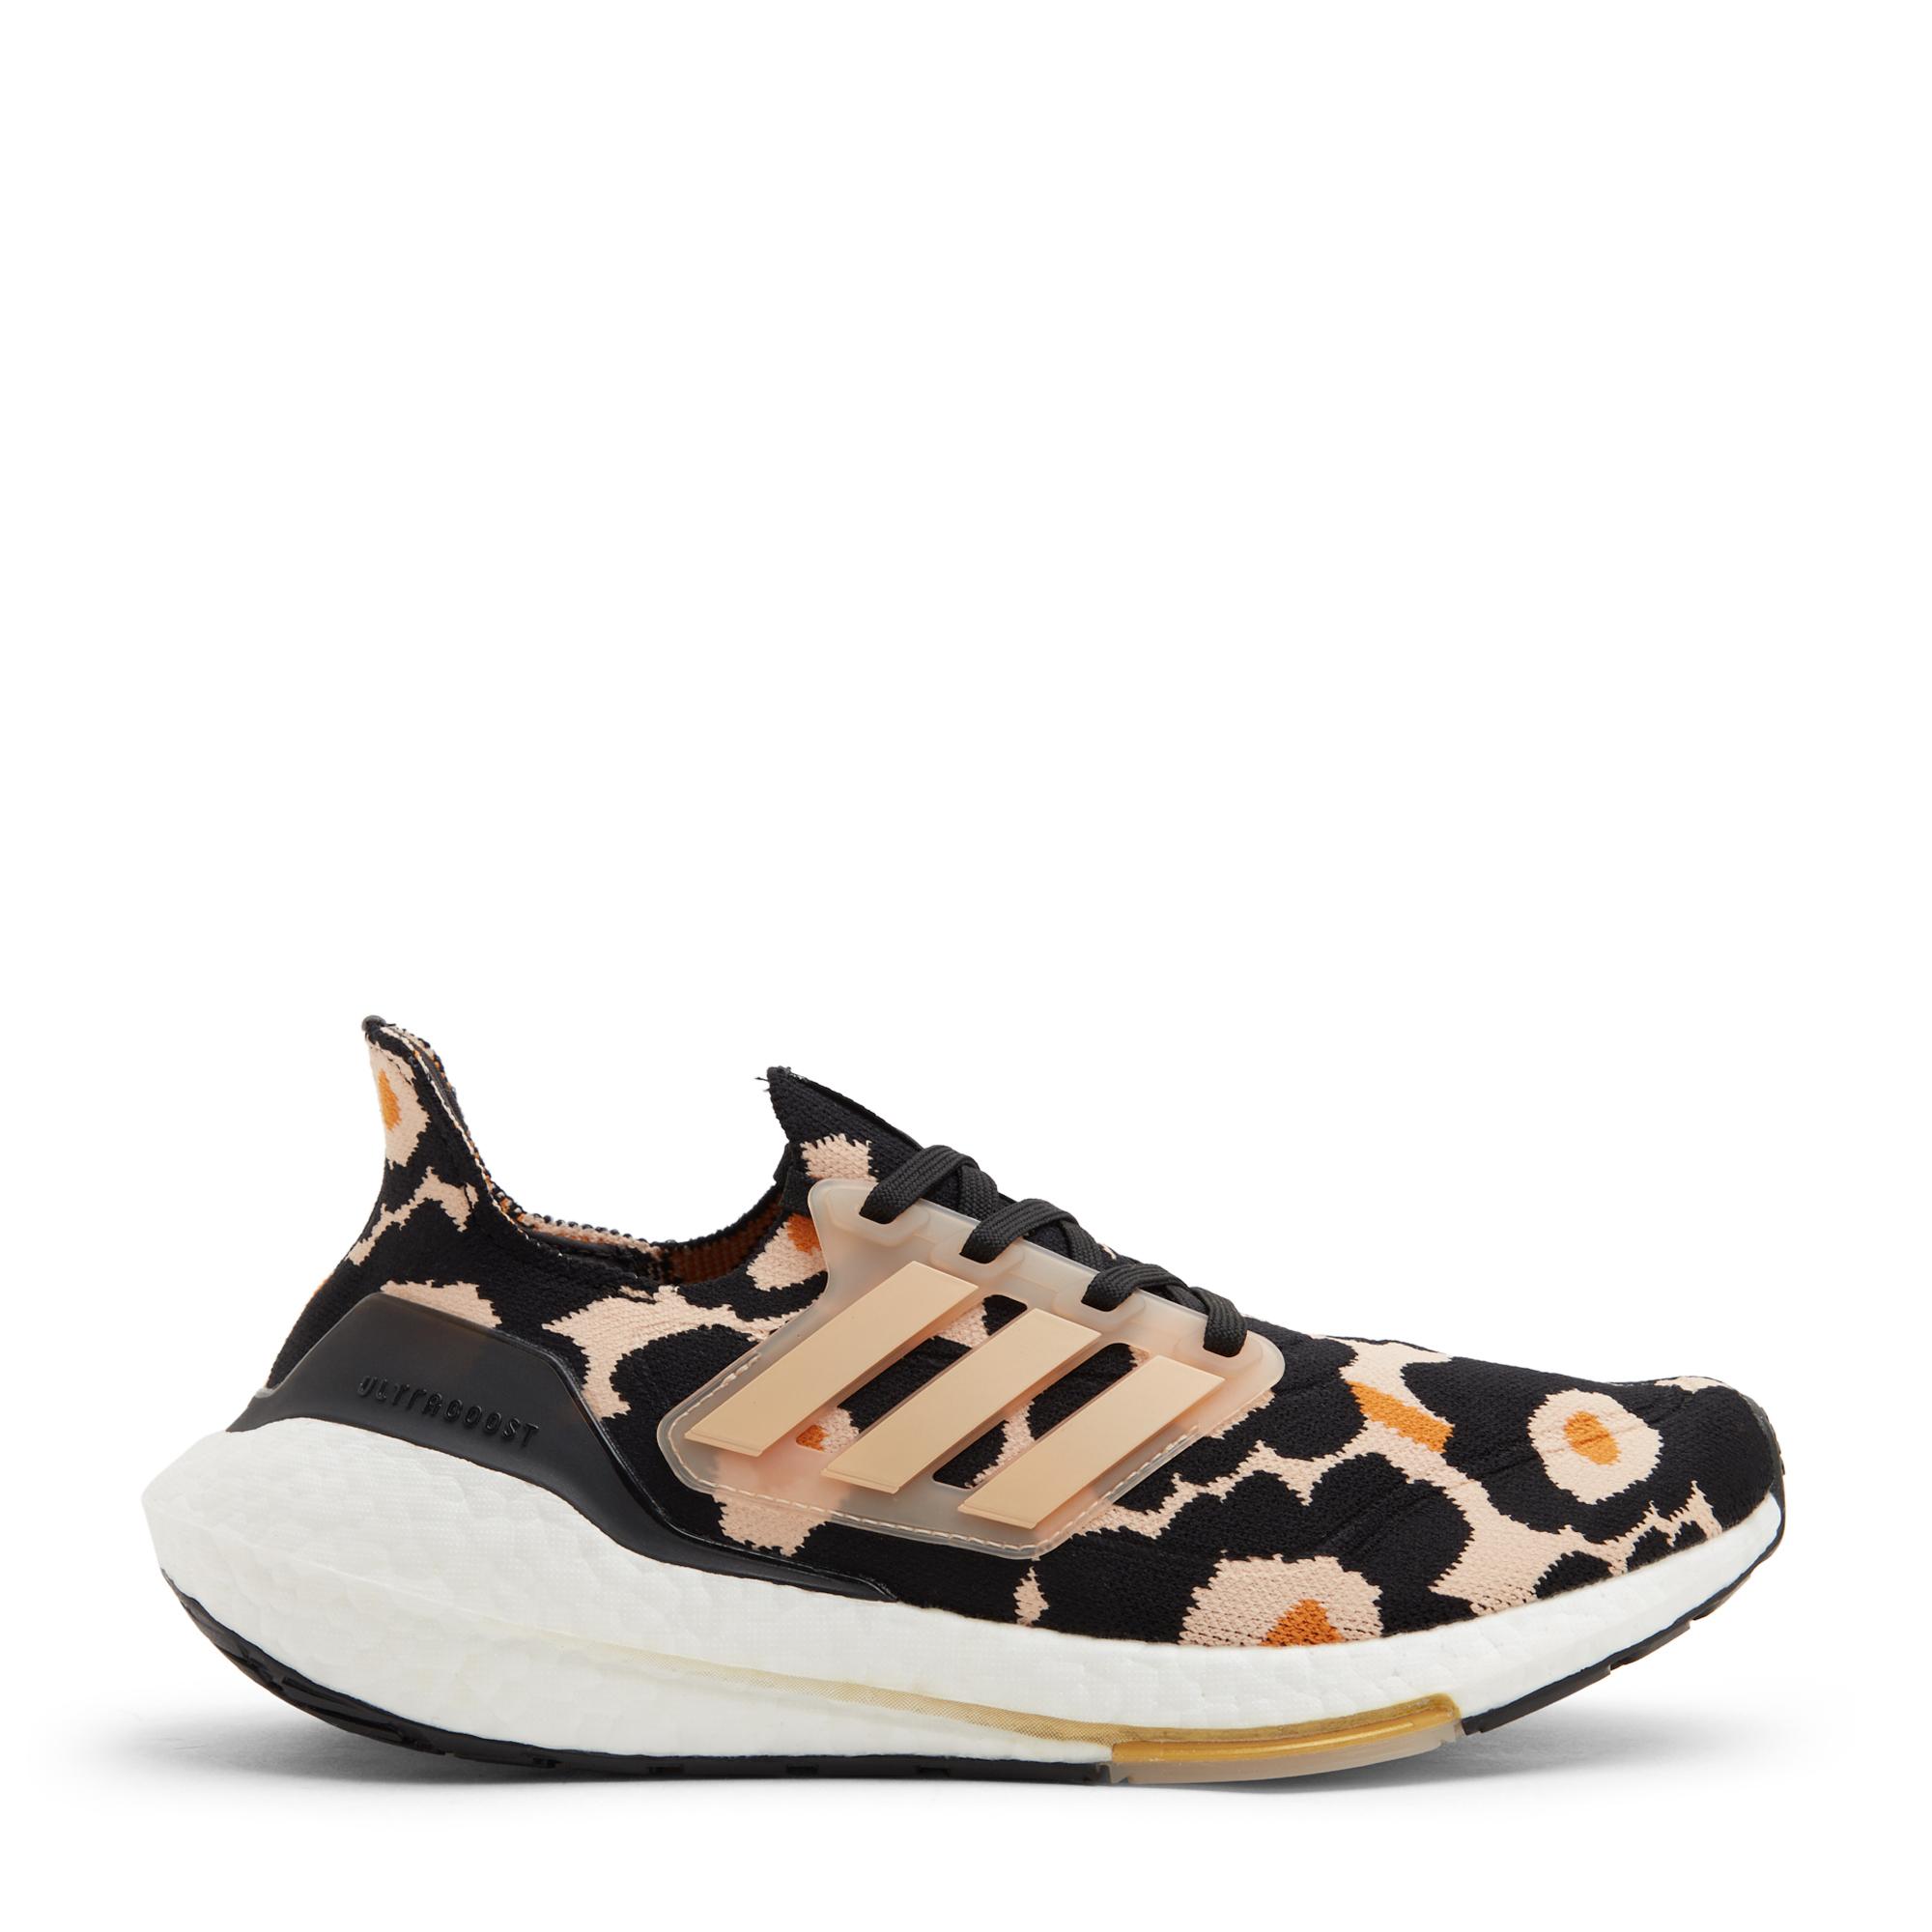 x Marimekko Ultraboost 21 sneakers